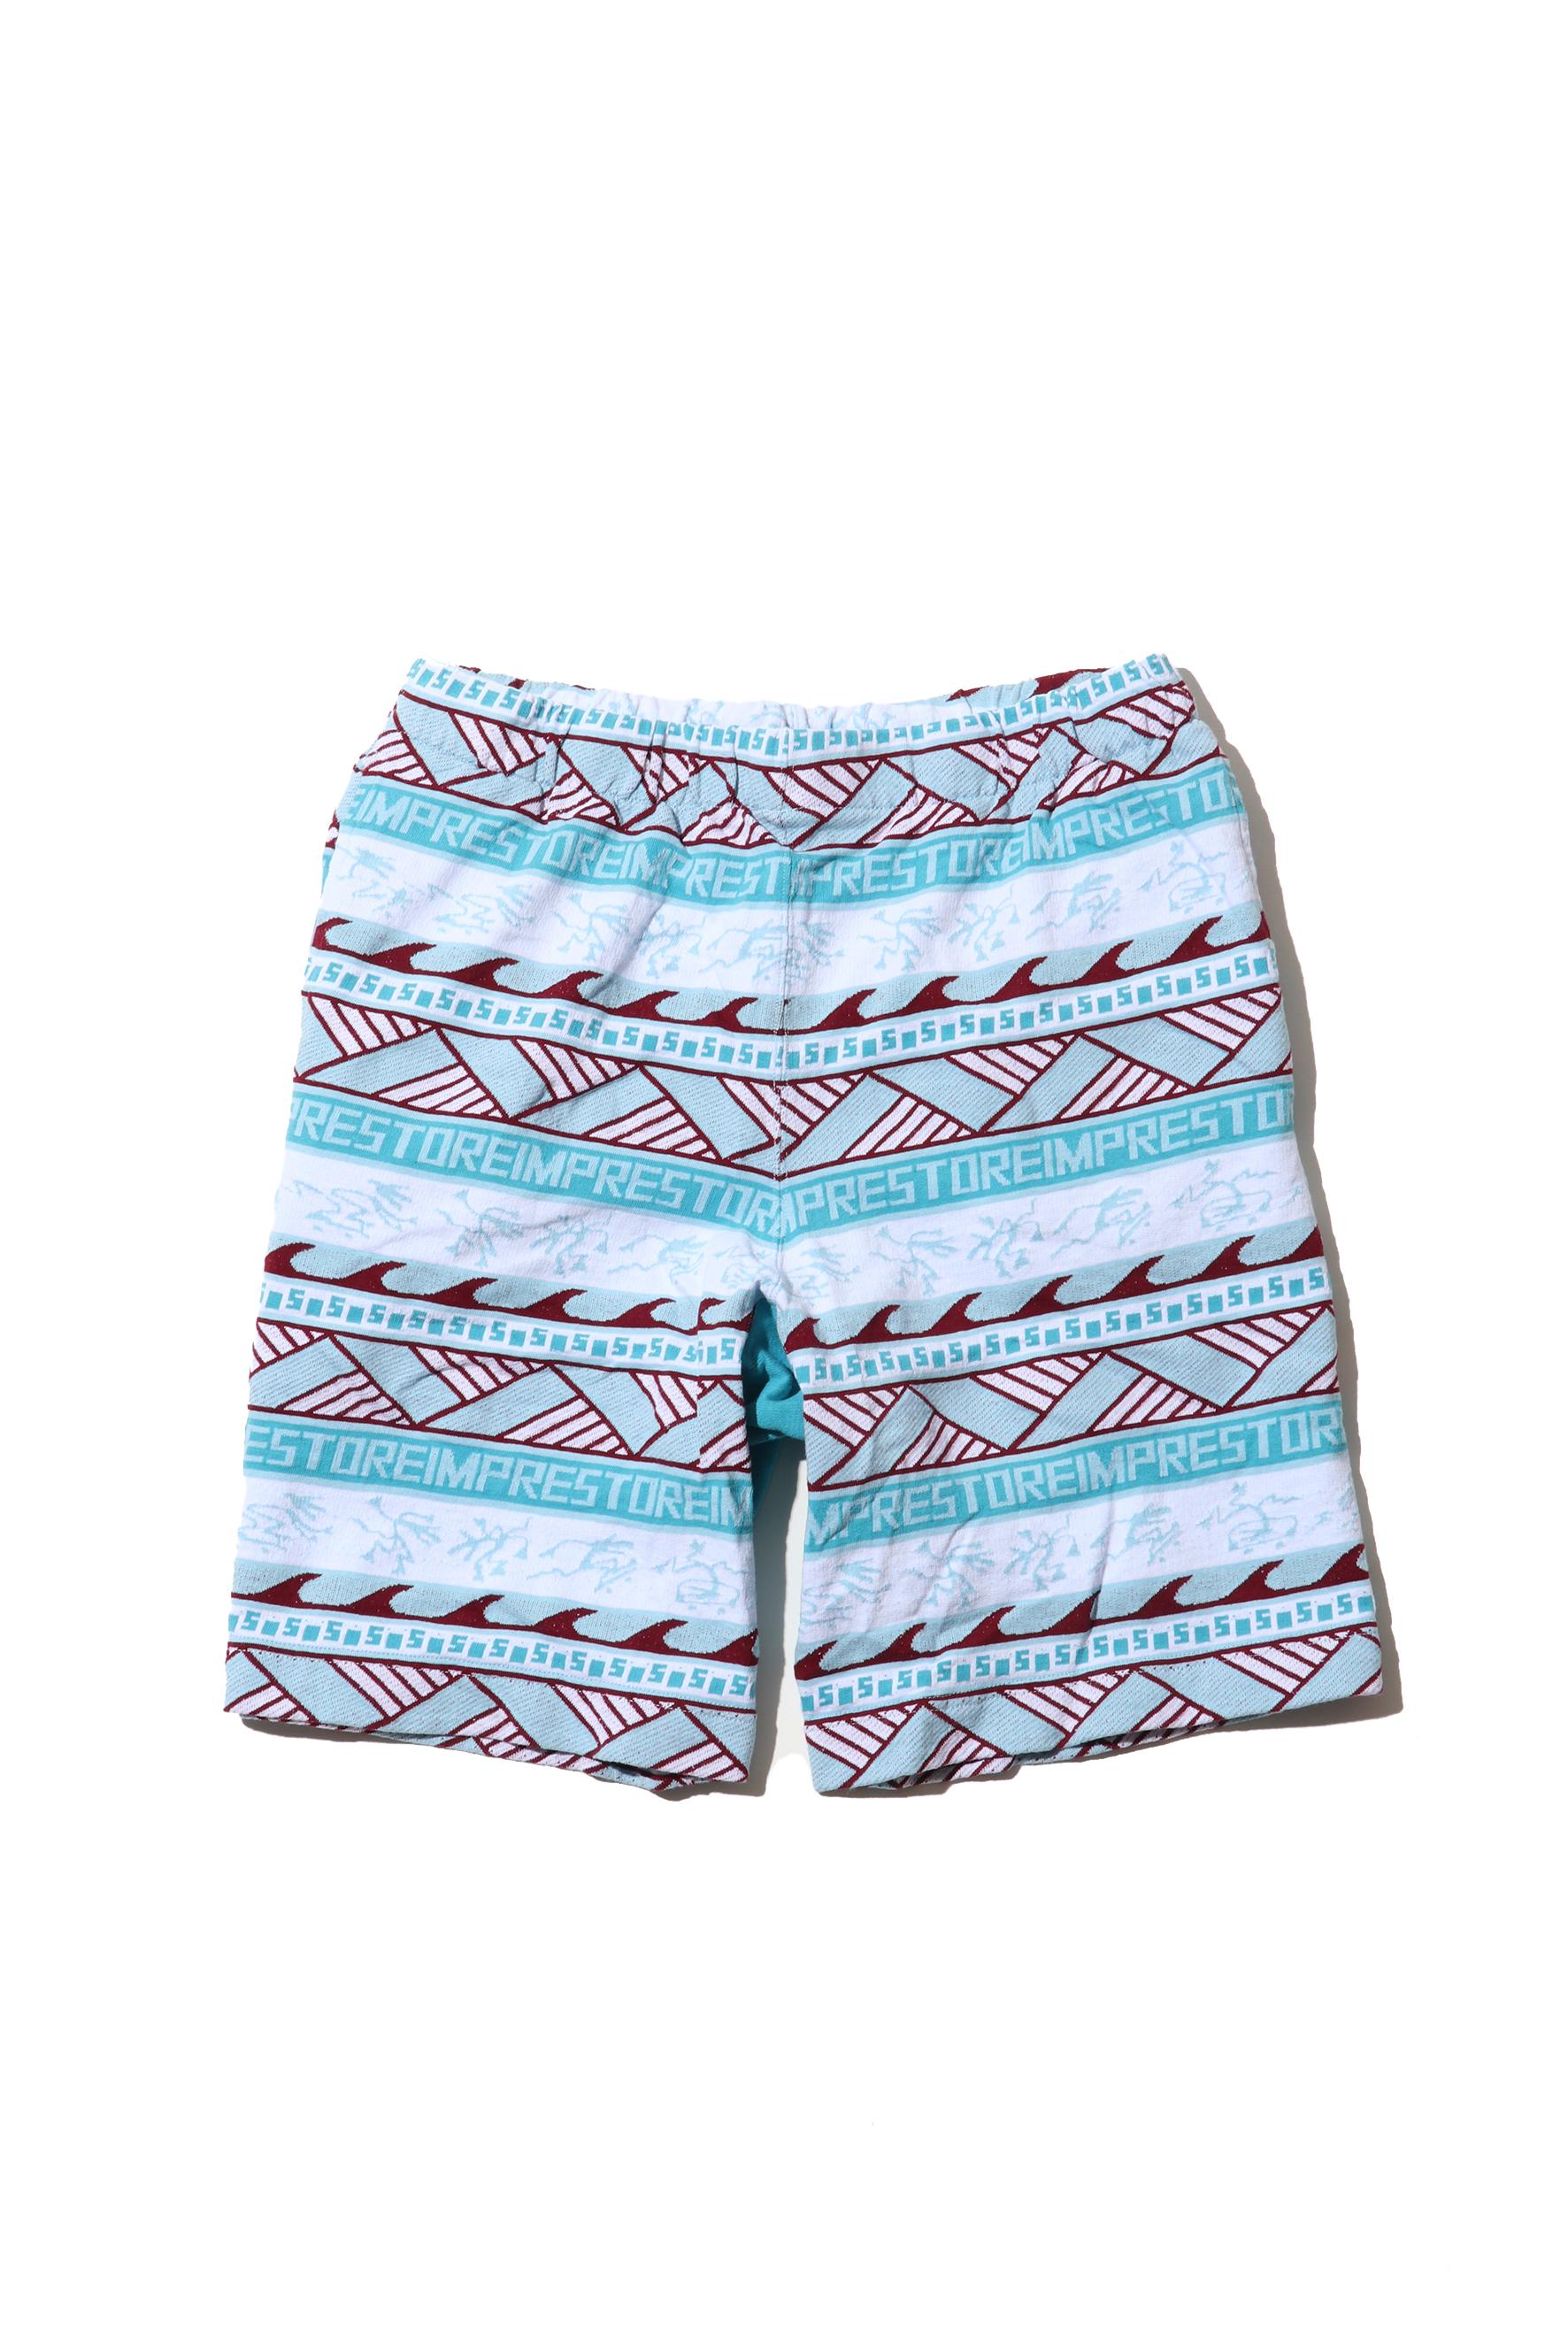 Original Jacquard Shorts / sax